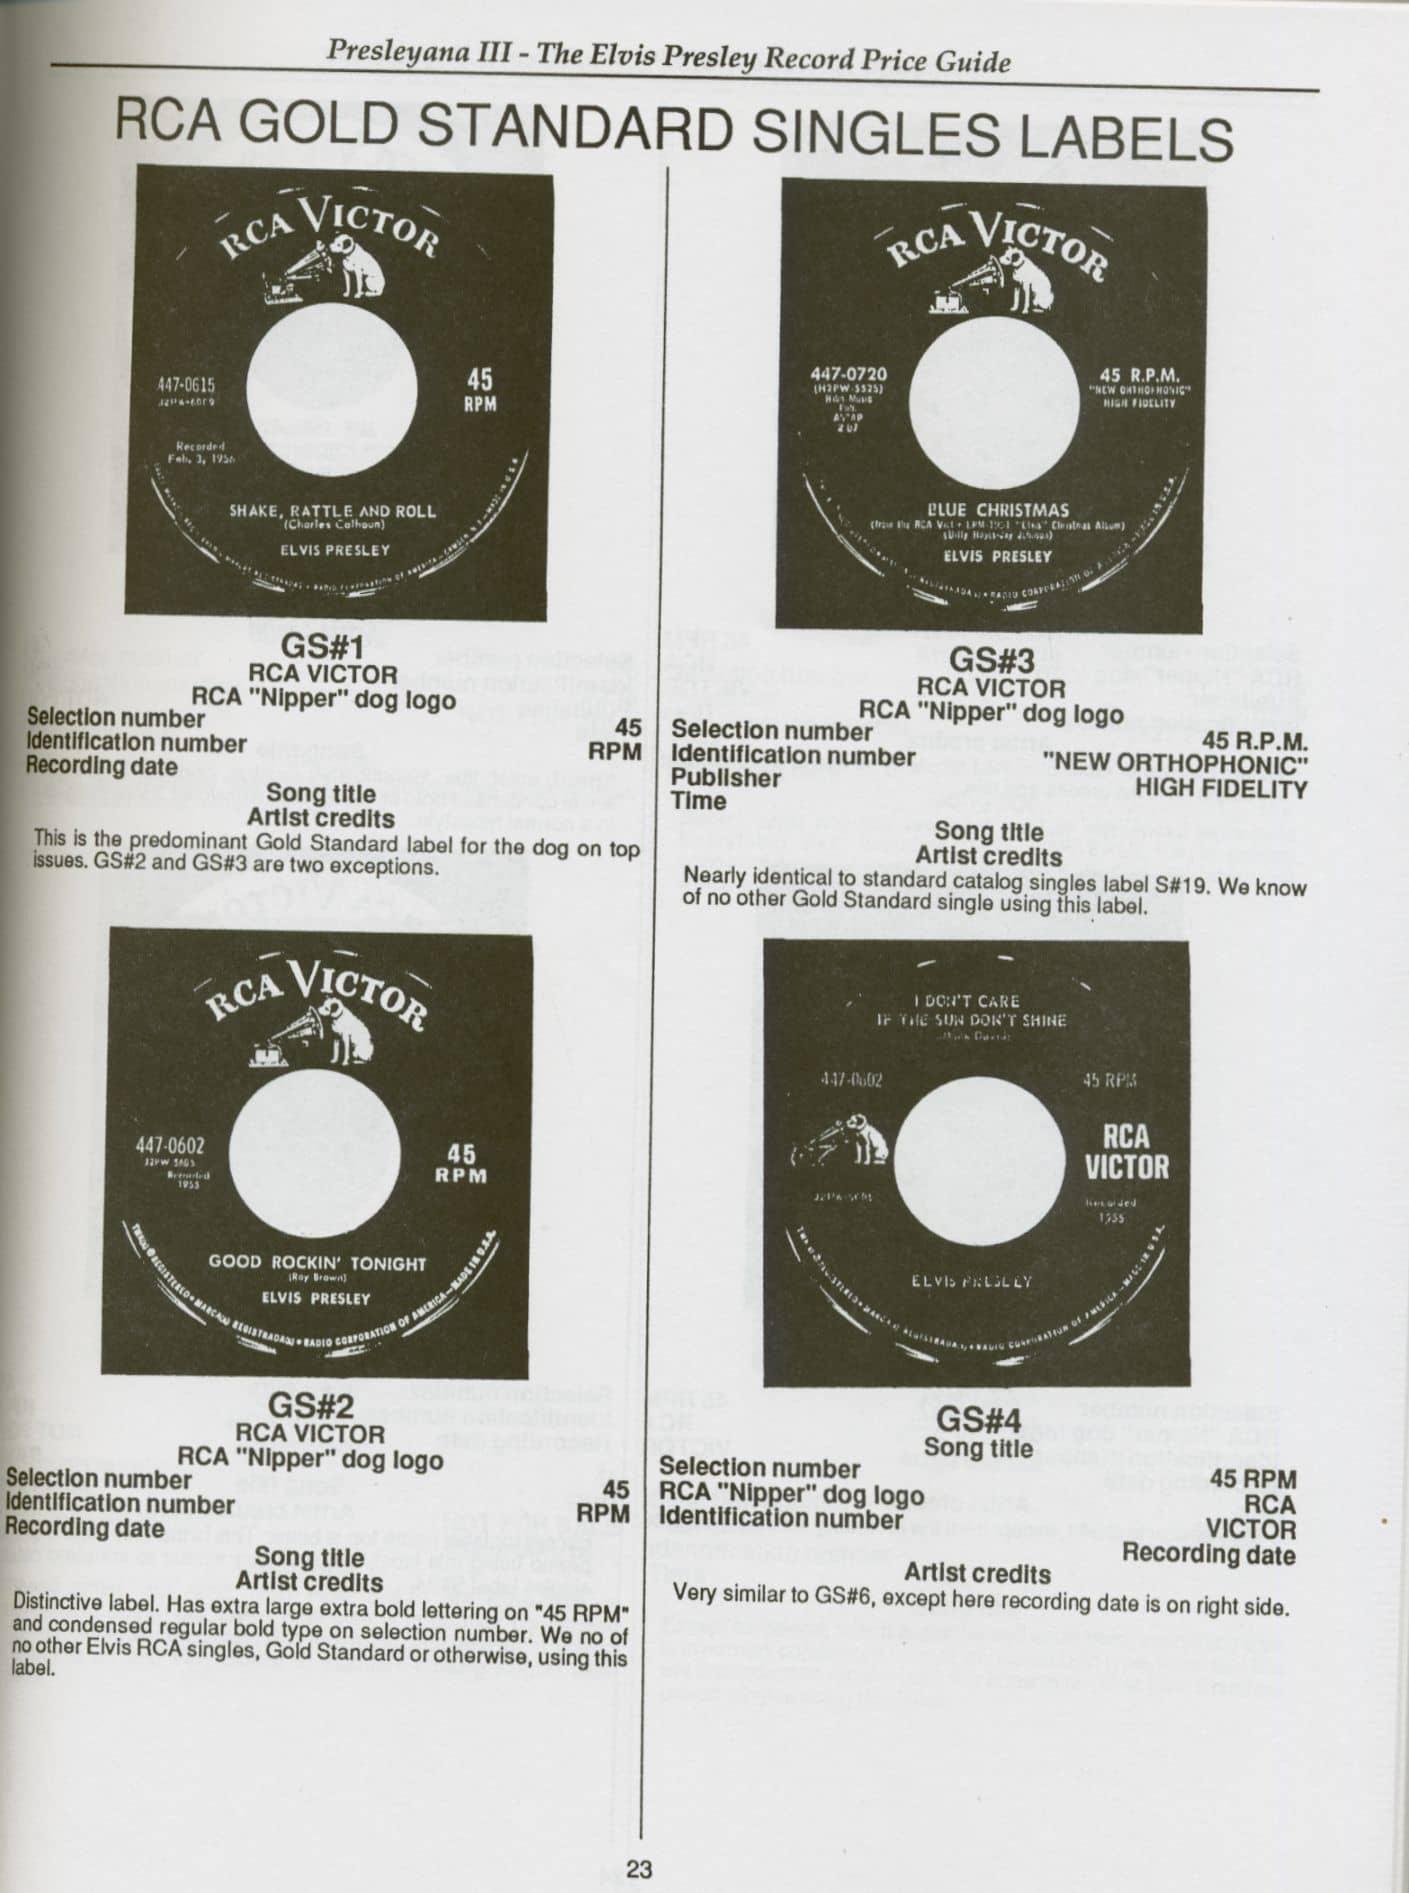 Preview Presleyana 3rd Edition Jerry Osborne s Elvis Presley Record Price